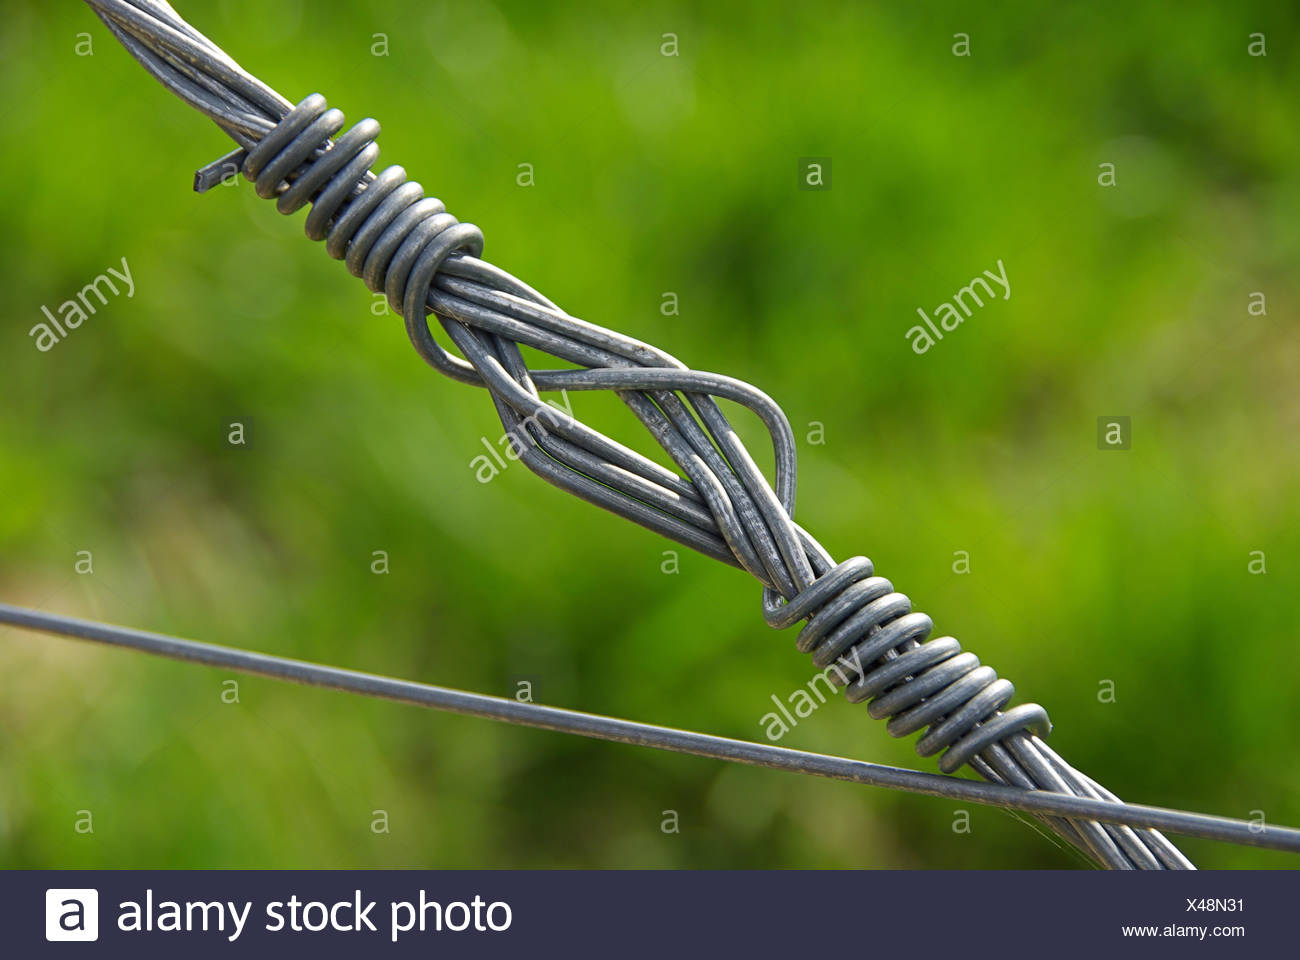 Steel Knot Stockfotos & Steel Knot Bilder - Alamy